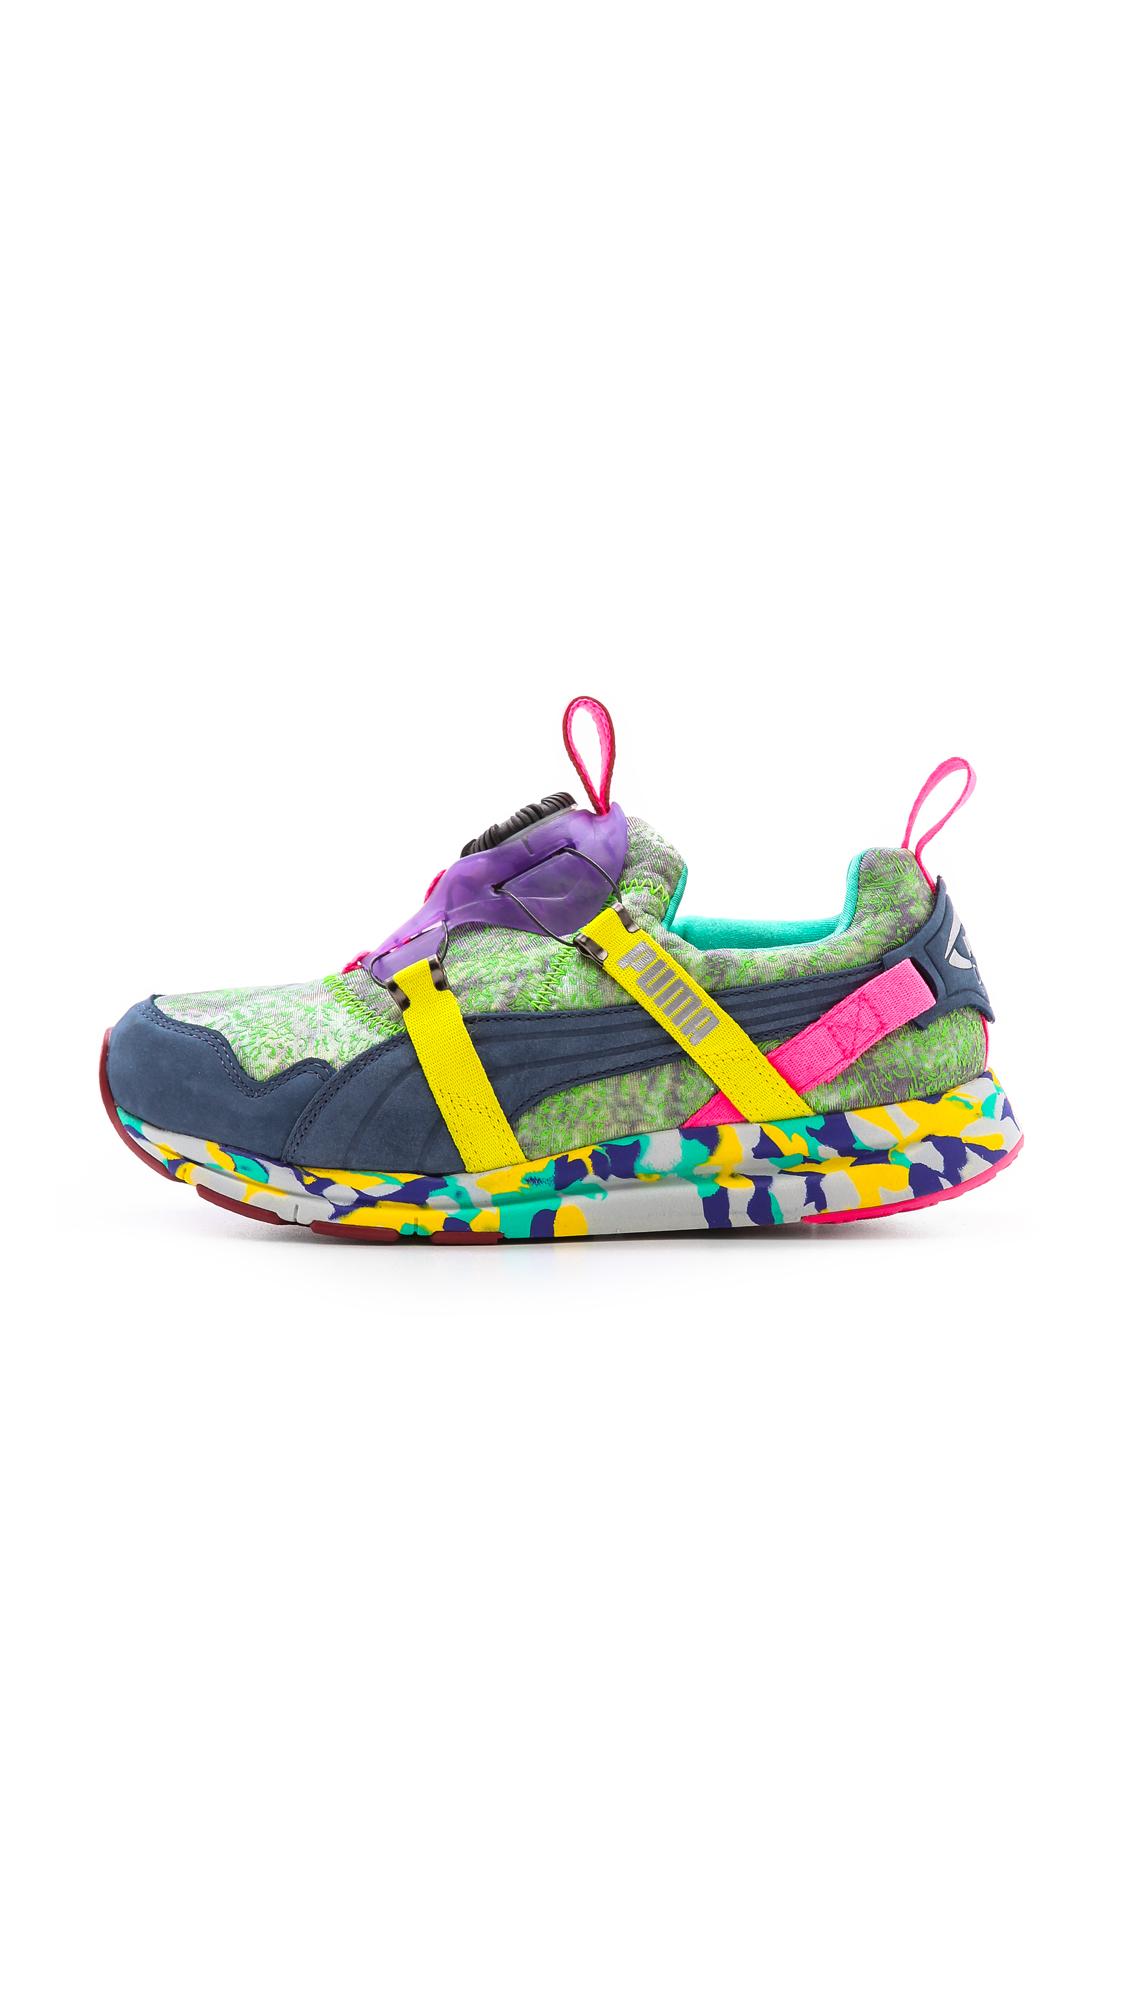 PUMA Puma x Solange Girls of Blaze Disc Rainforest Sneakers  9a929b488